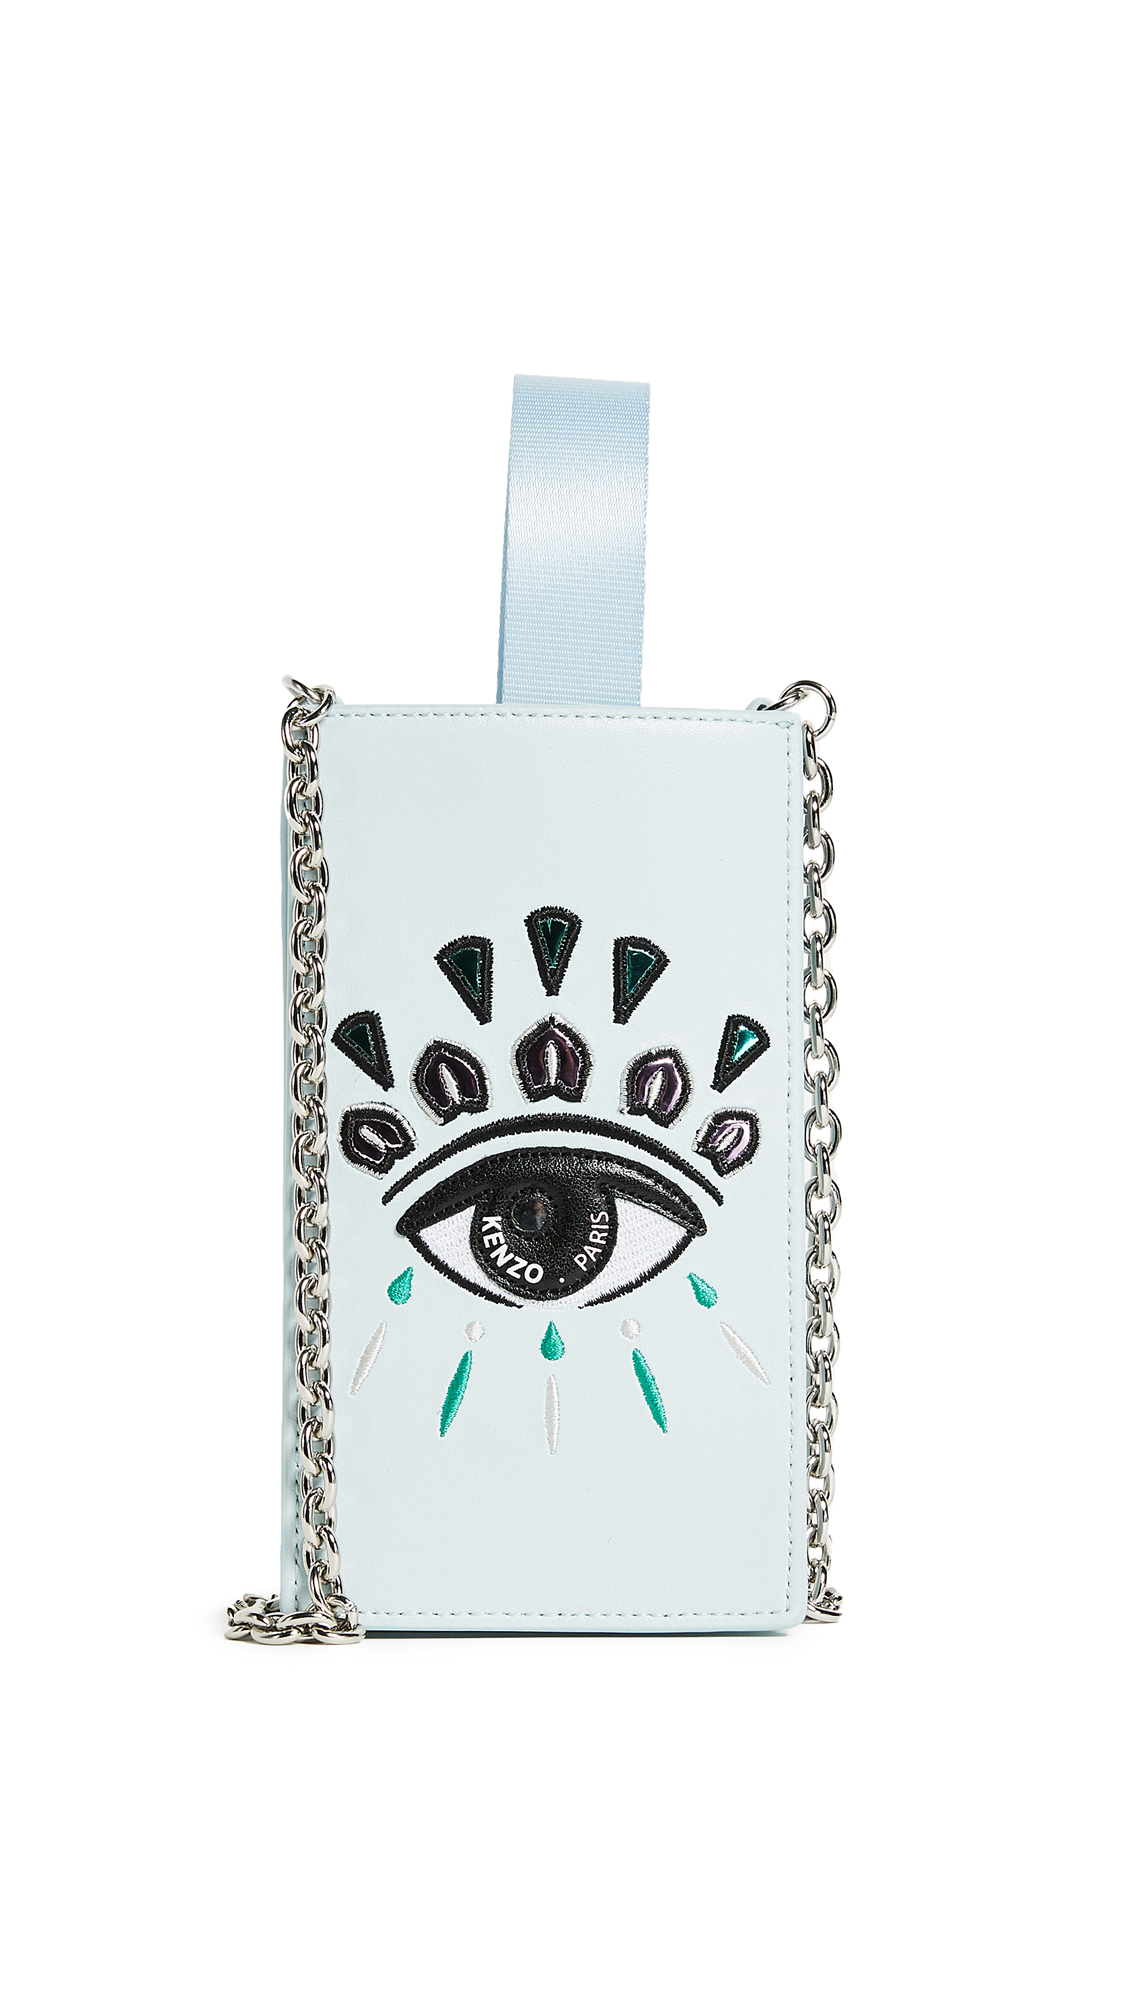 KENZO Phone Bag - Sky Blue